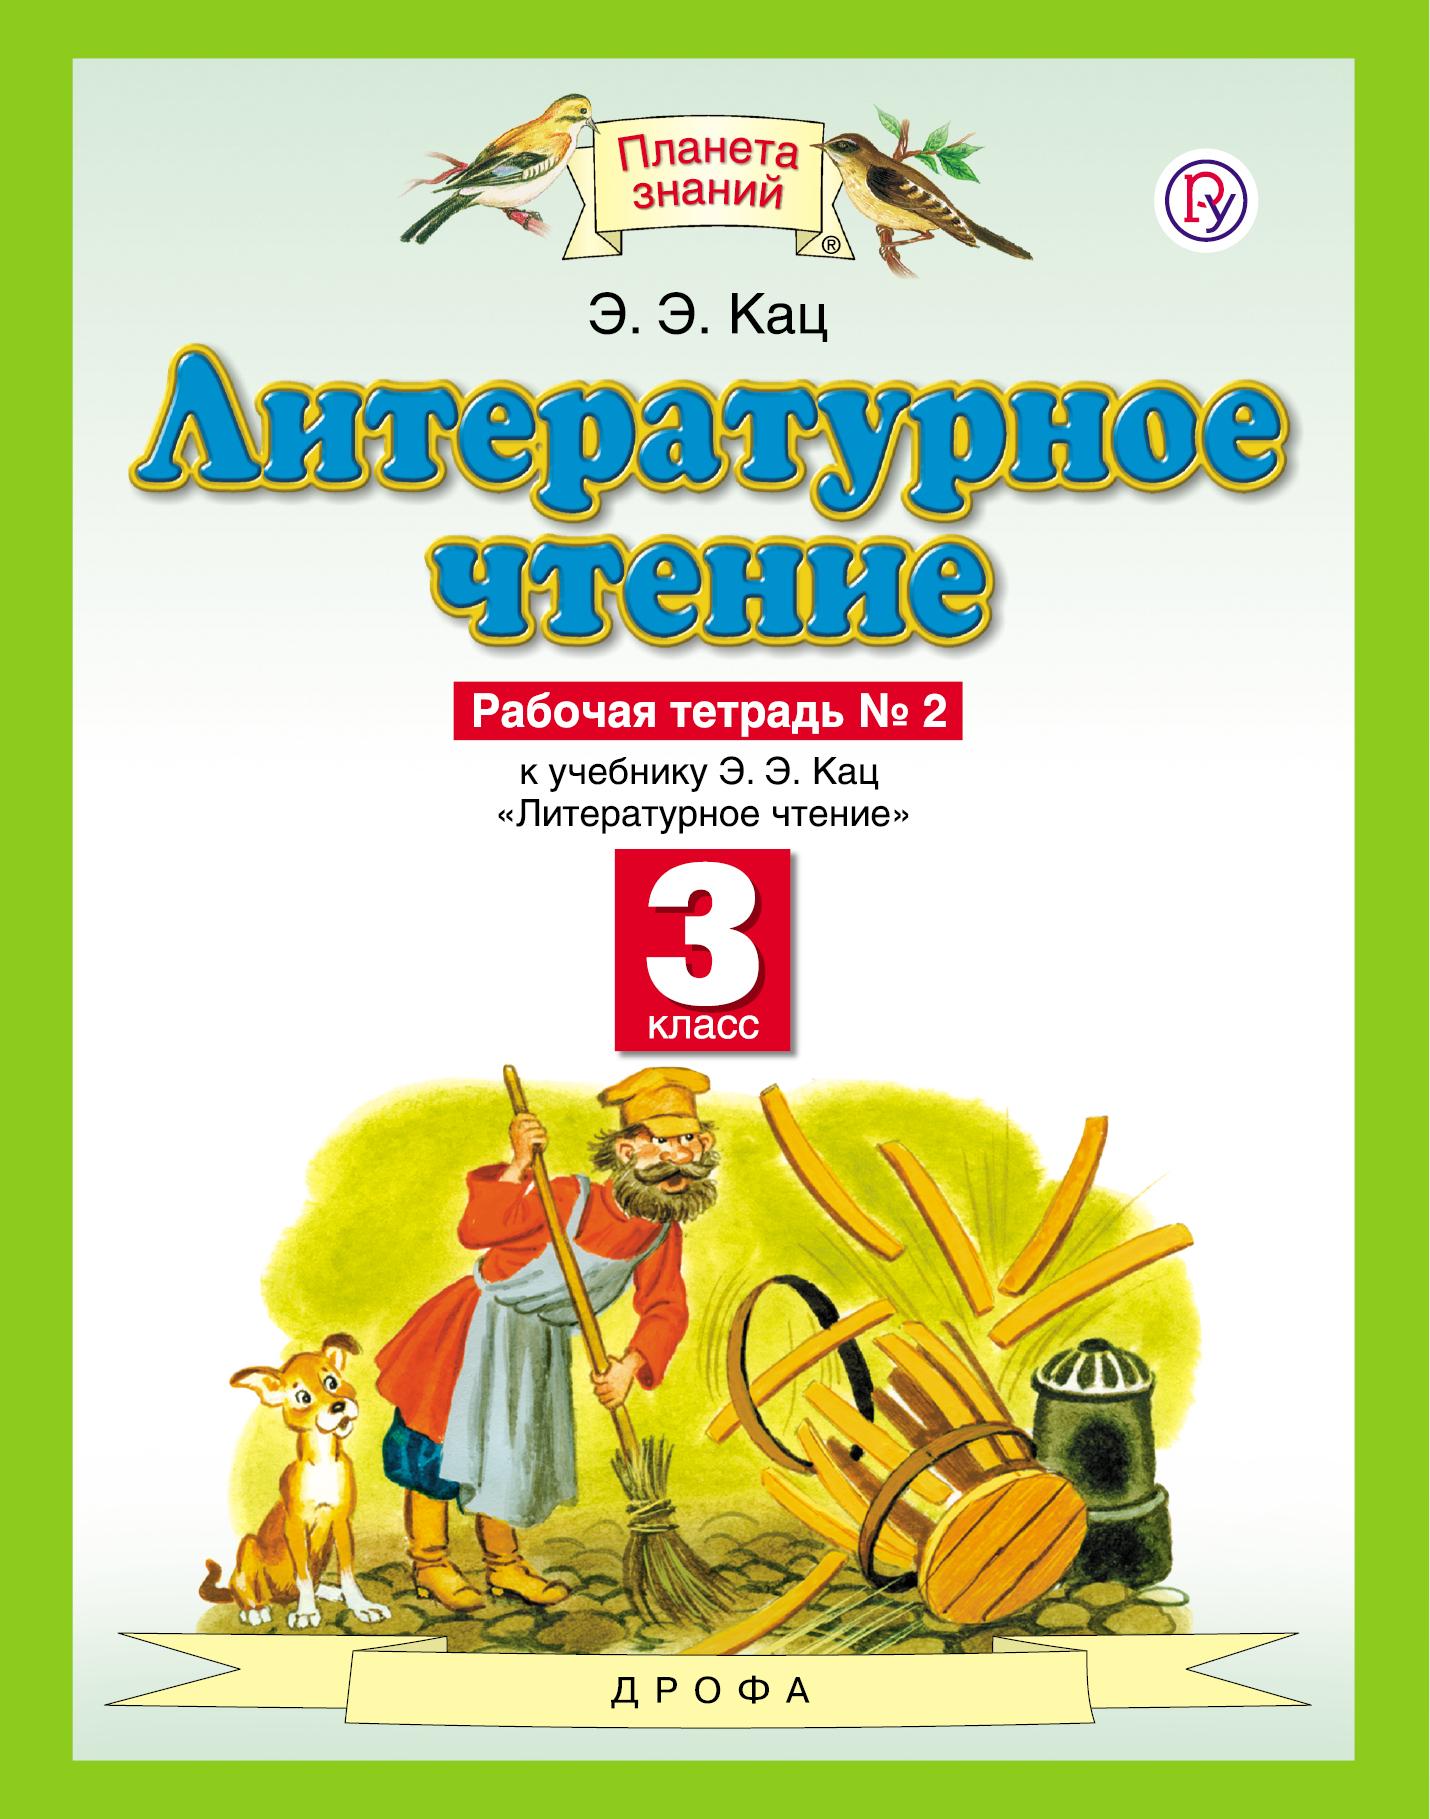 Кац Э.Э. Литературное чтение. 3 класс. Рабочая тетрадь № 2